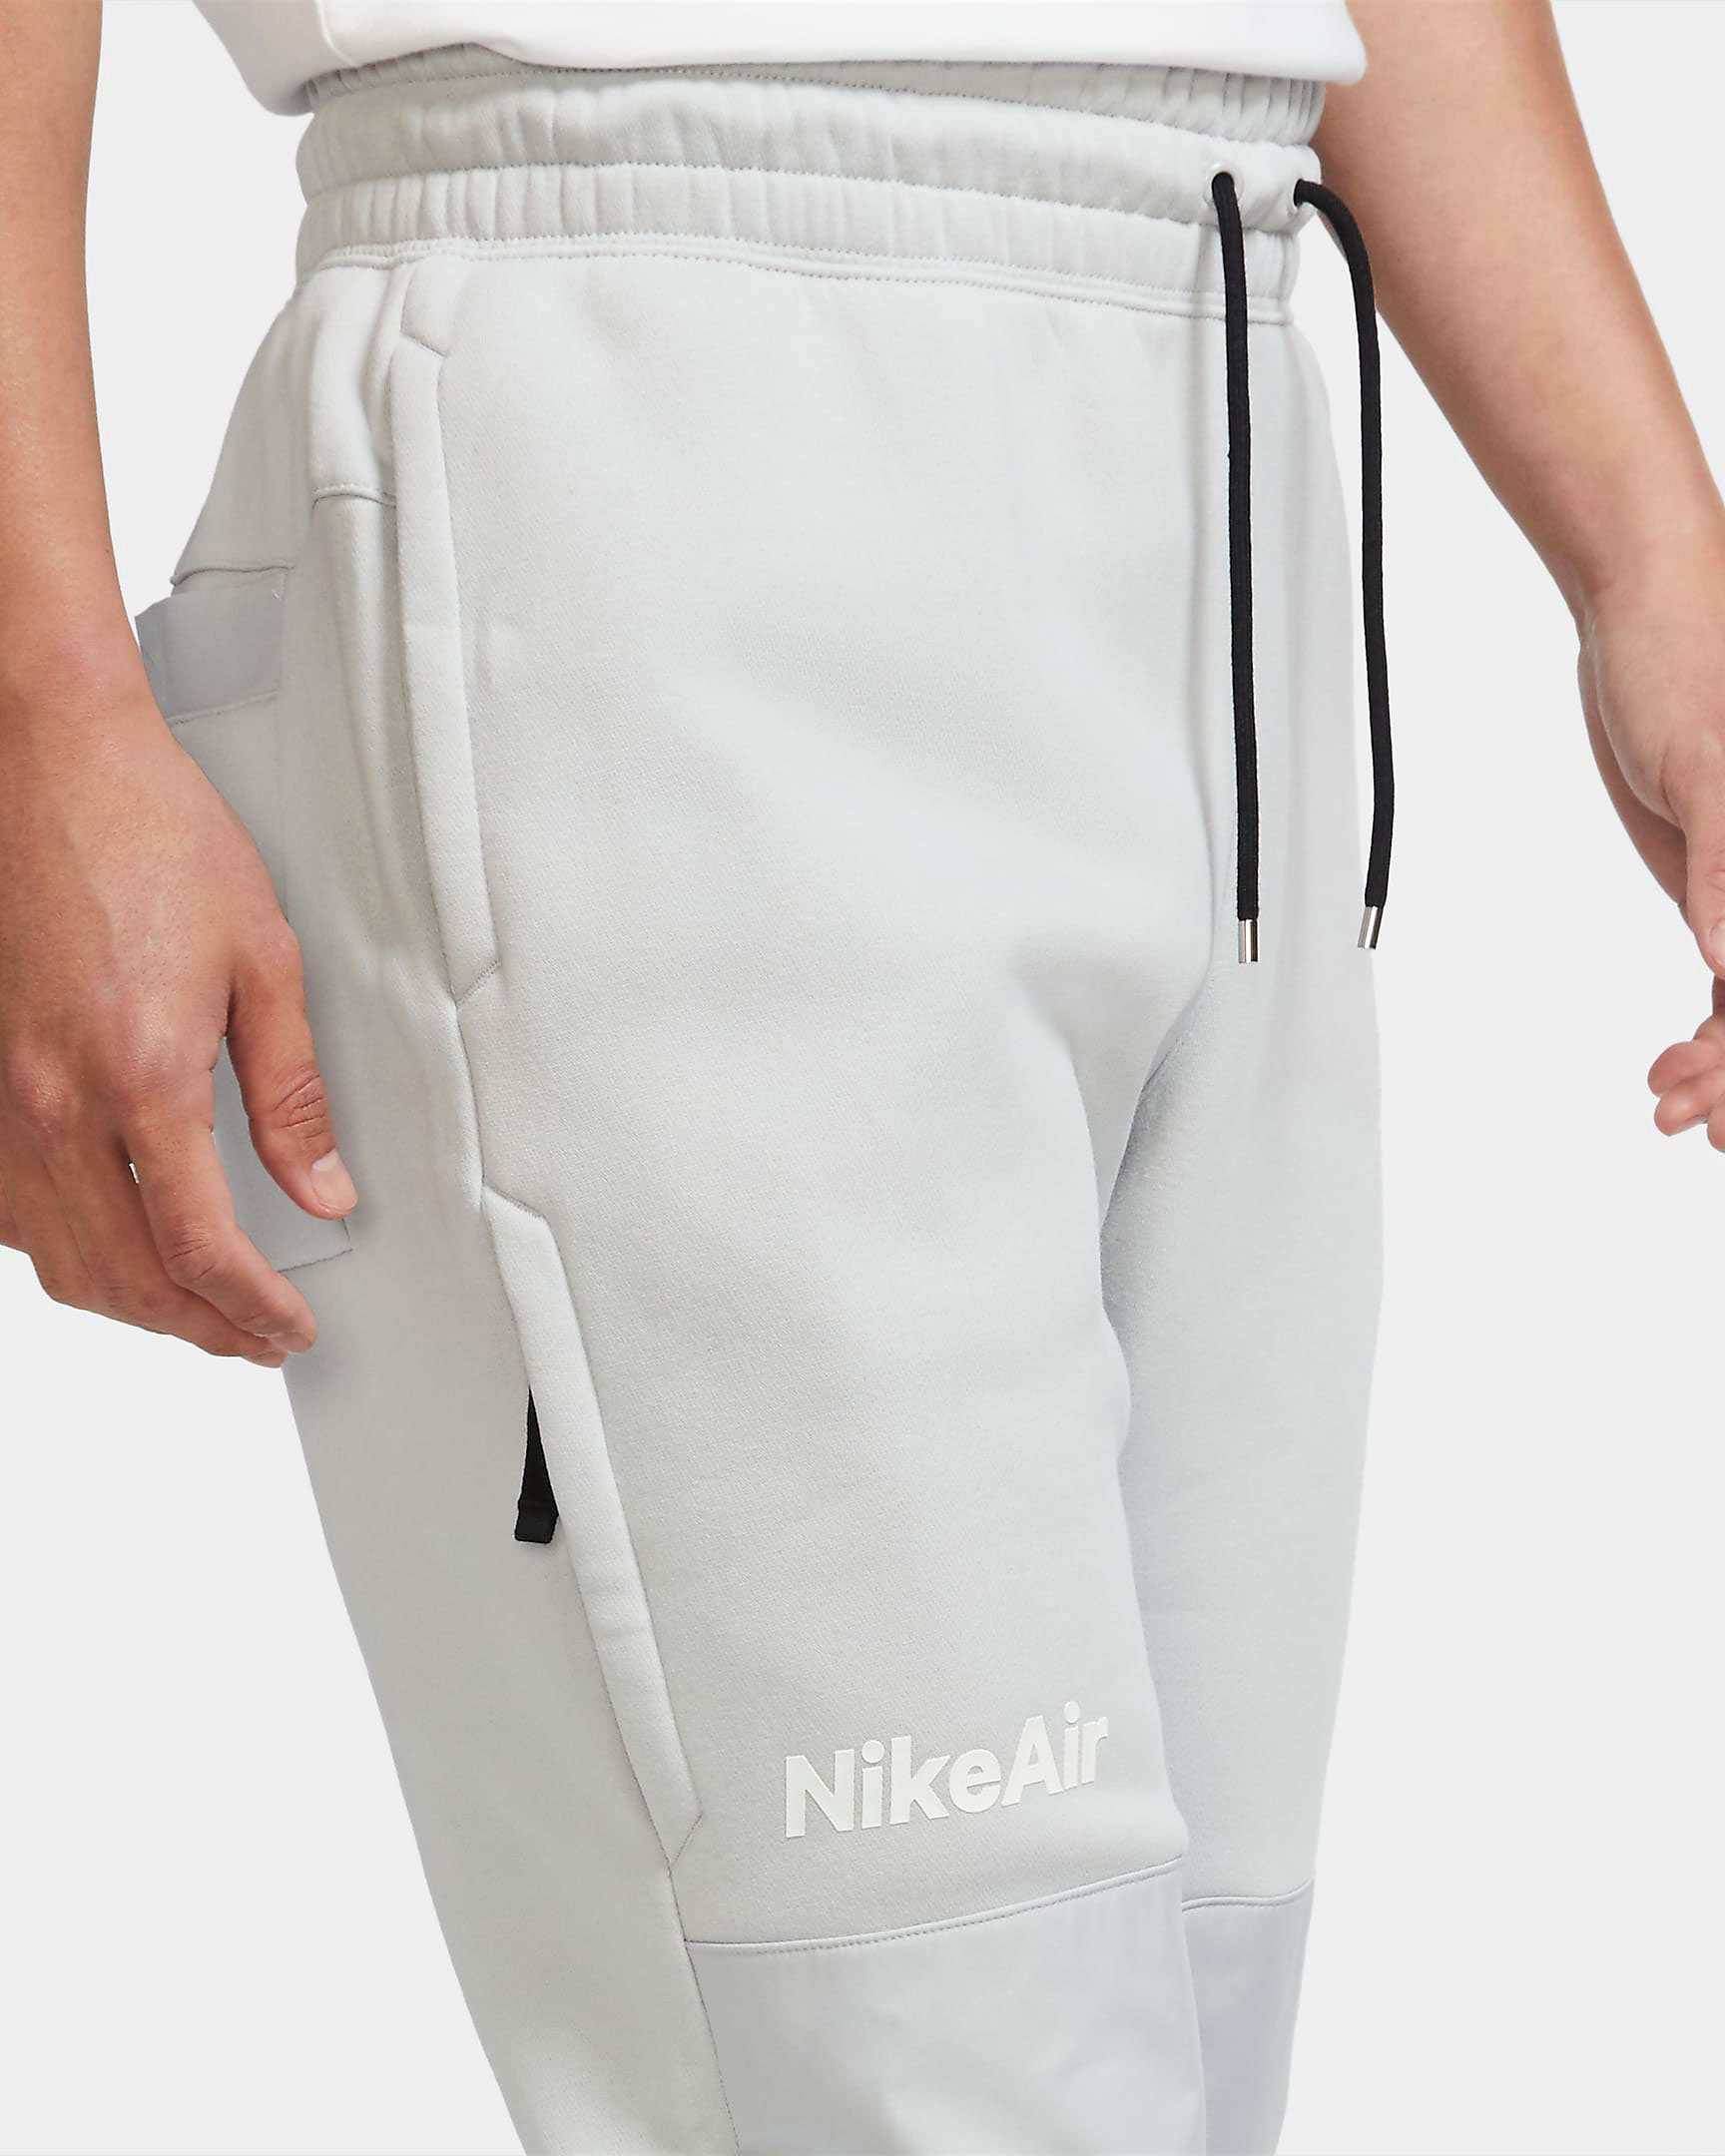 nike-air-fleece-pants-grey-fog-laser-blue-1